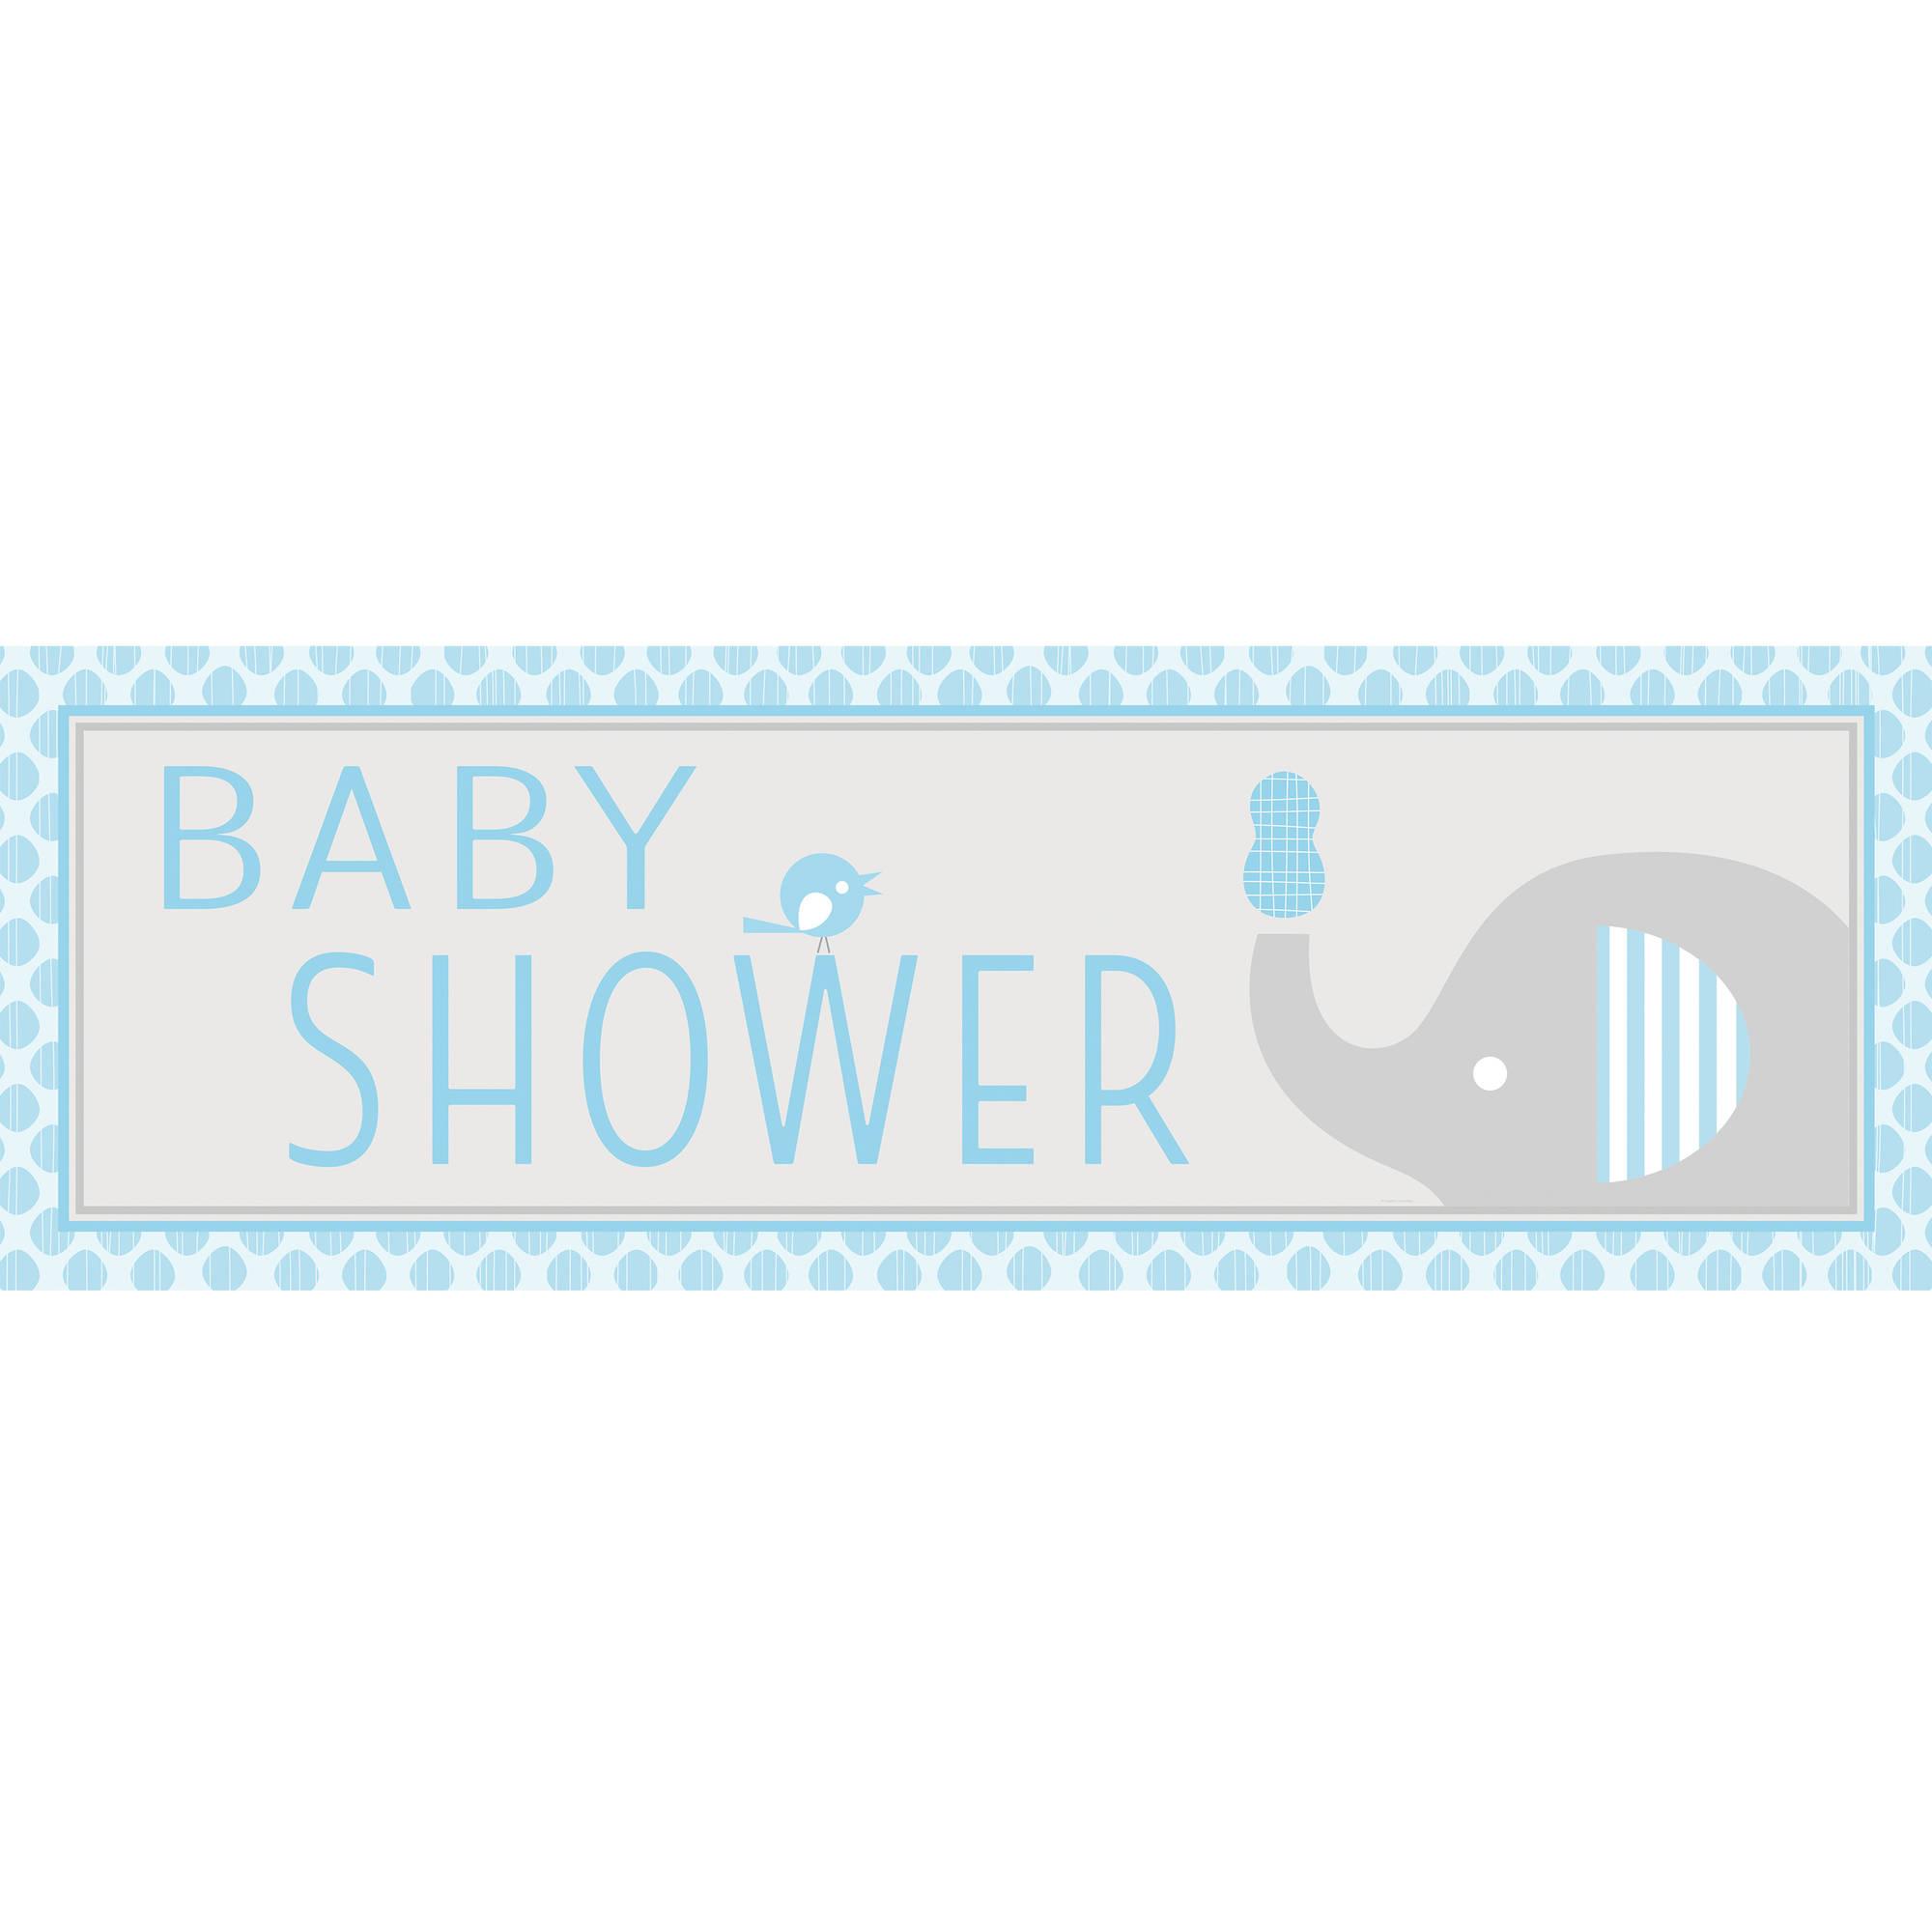 Little Peanut Boy Giant Baby Shower Banner Walmart Com